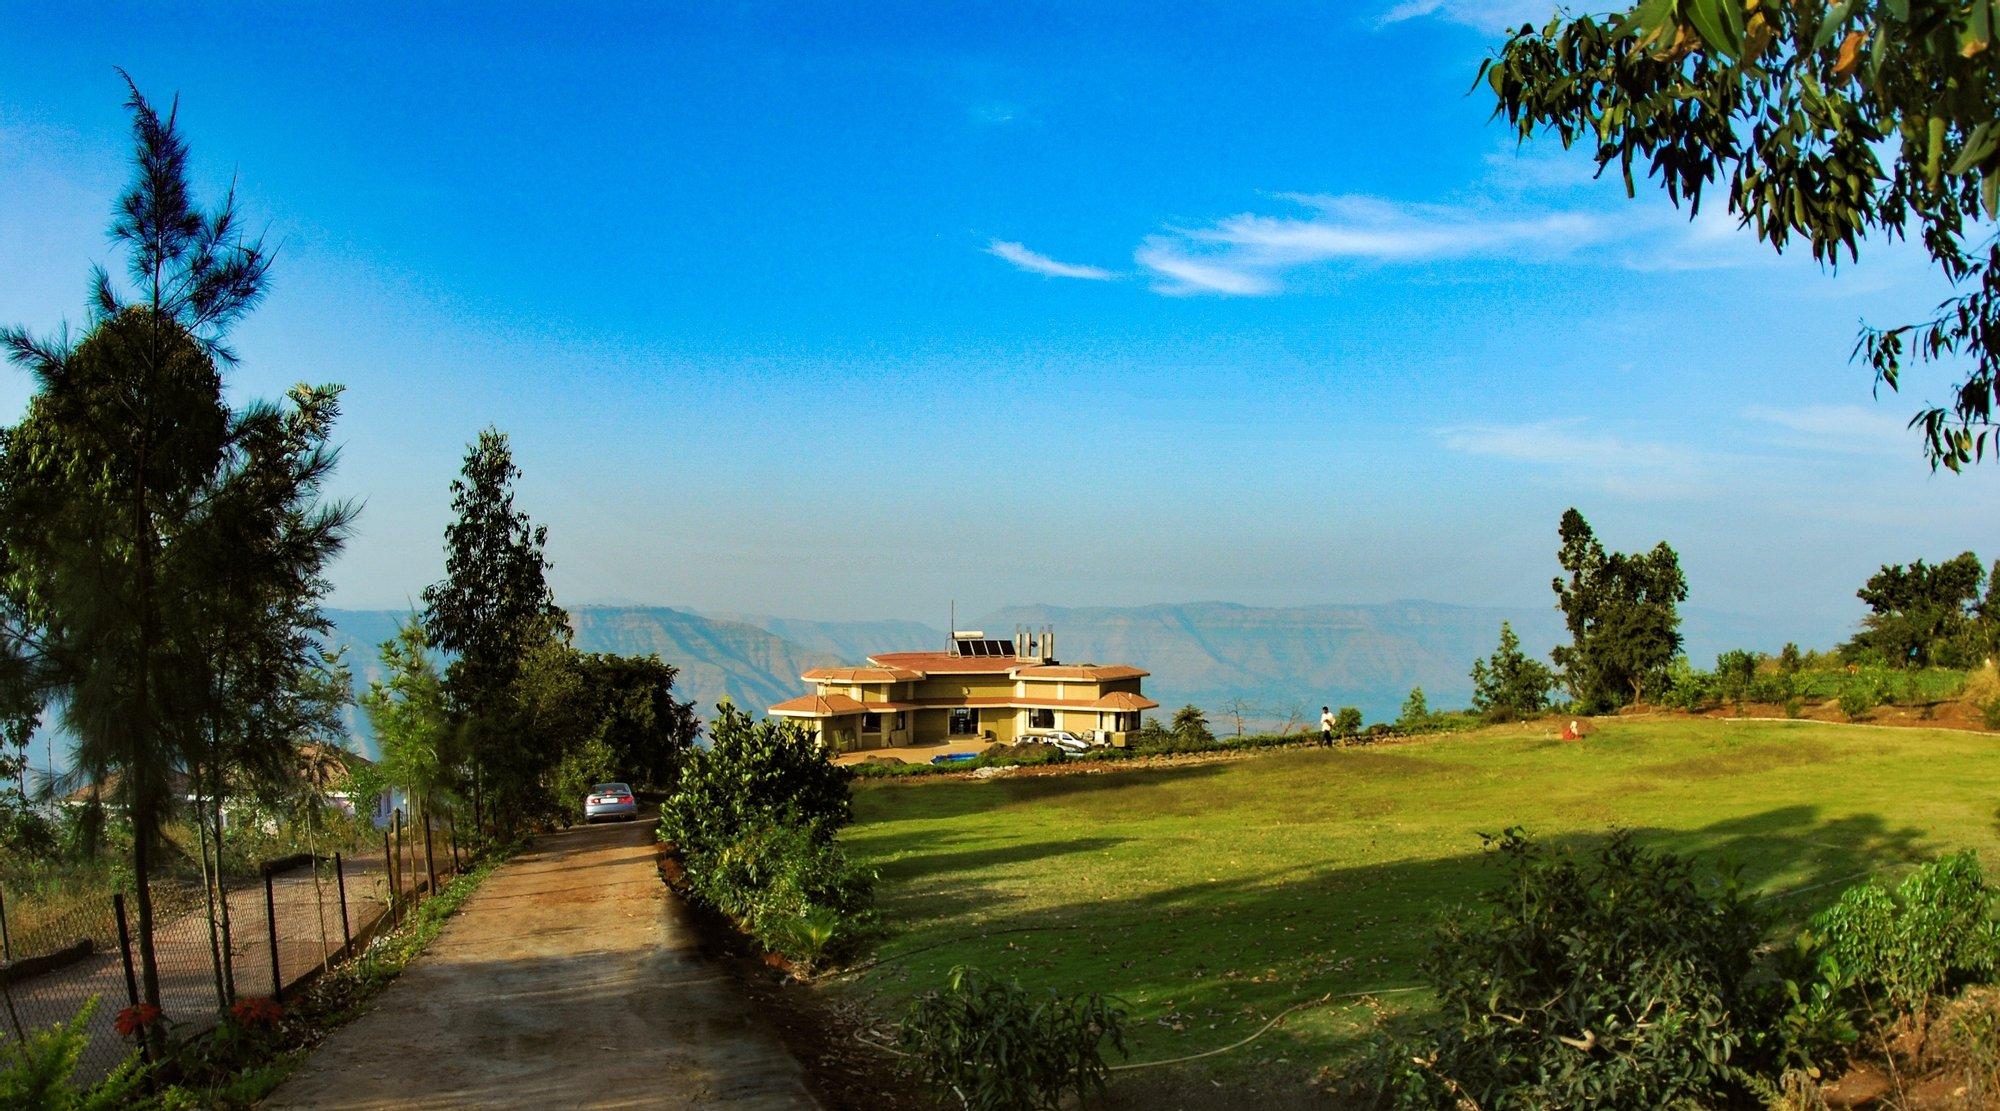 House in Mahabaleshwar, Maharashtra, India 1